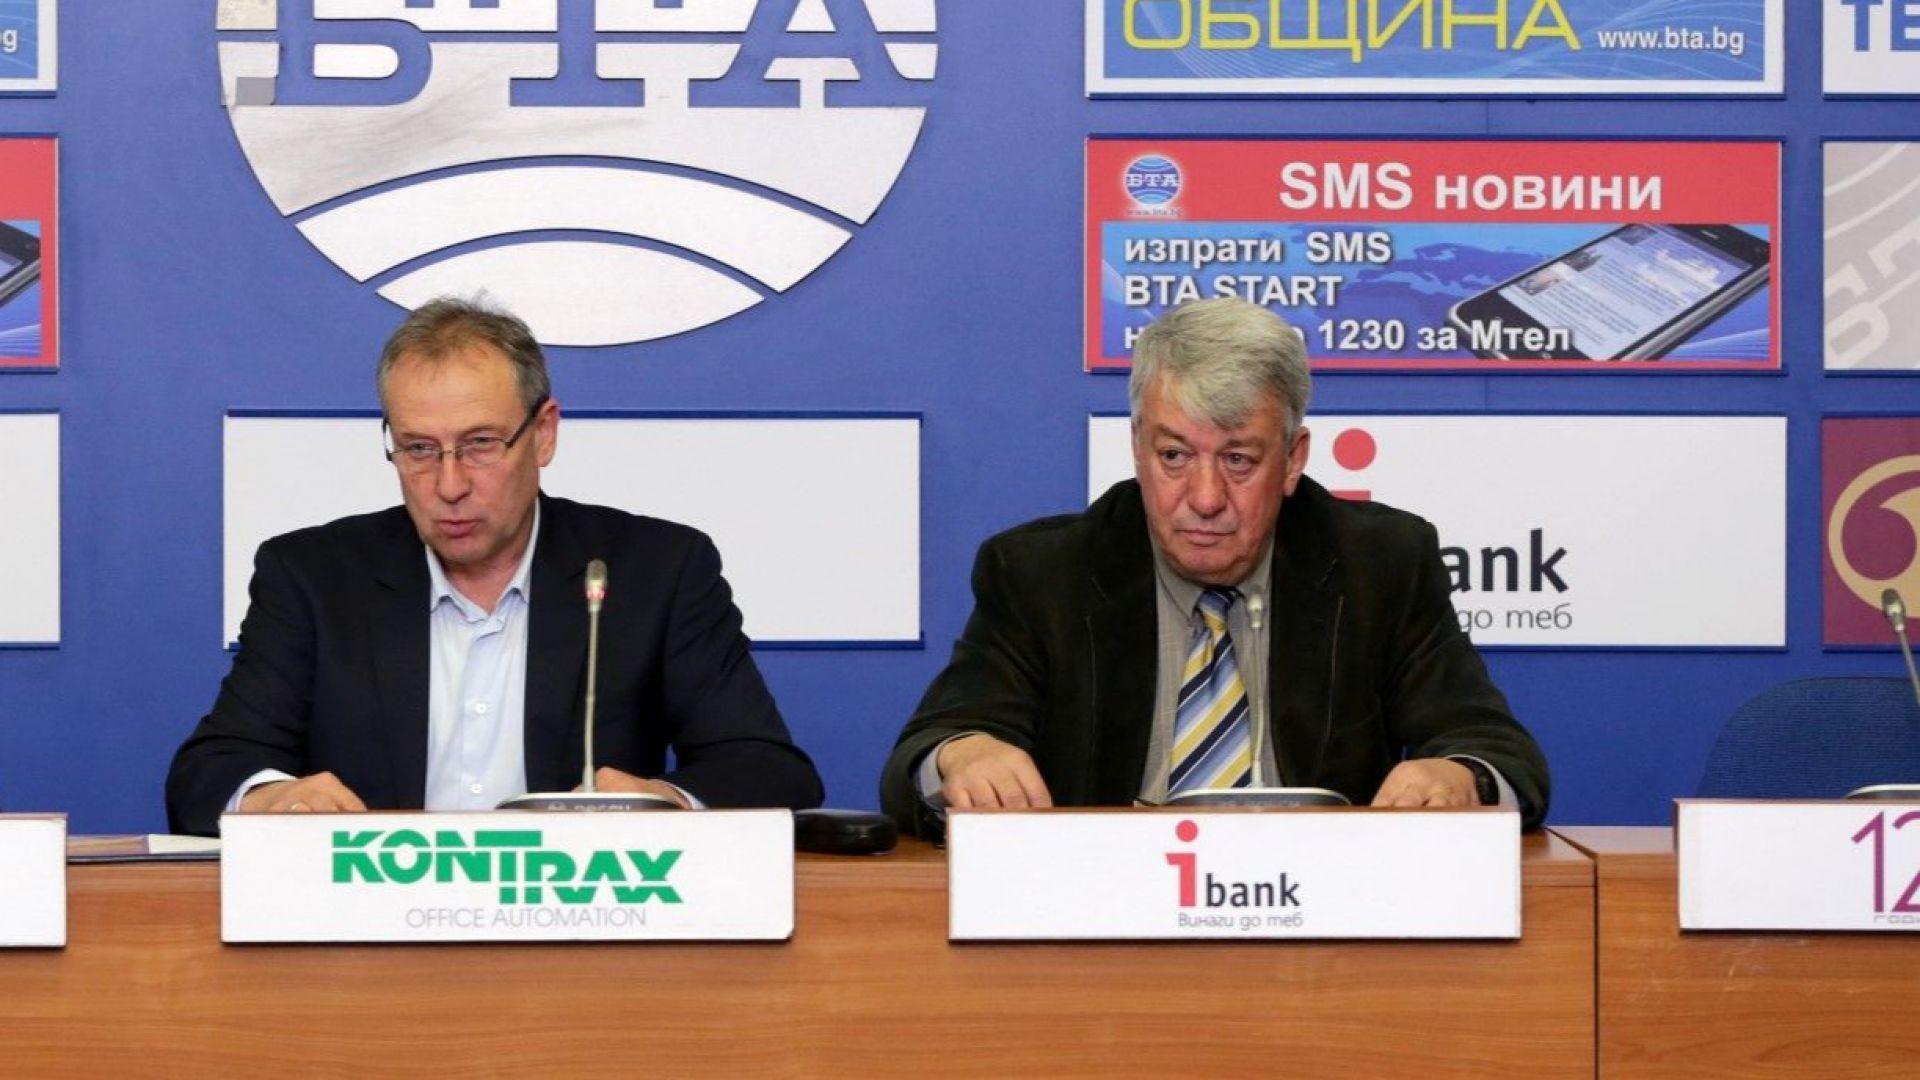 Пламен Стоянов и Симо Симов (вдясно)